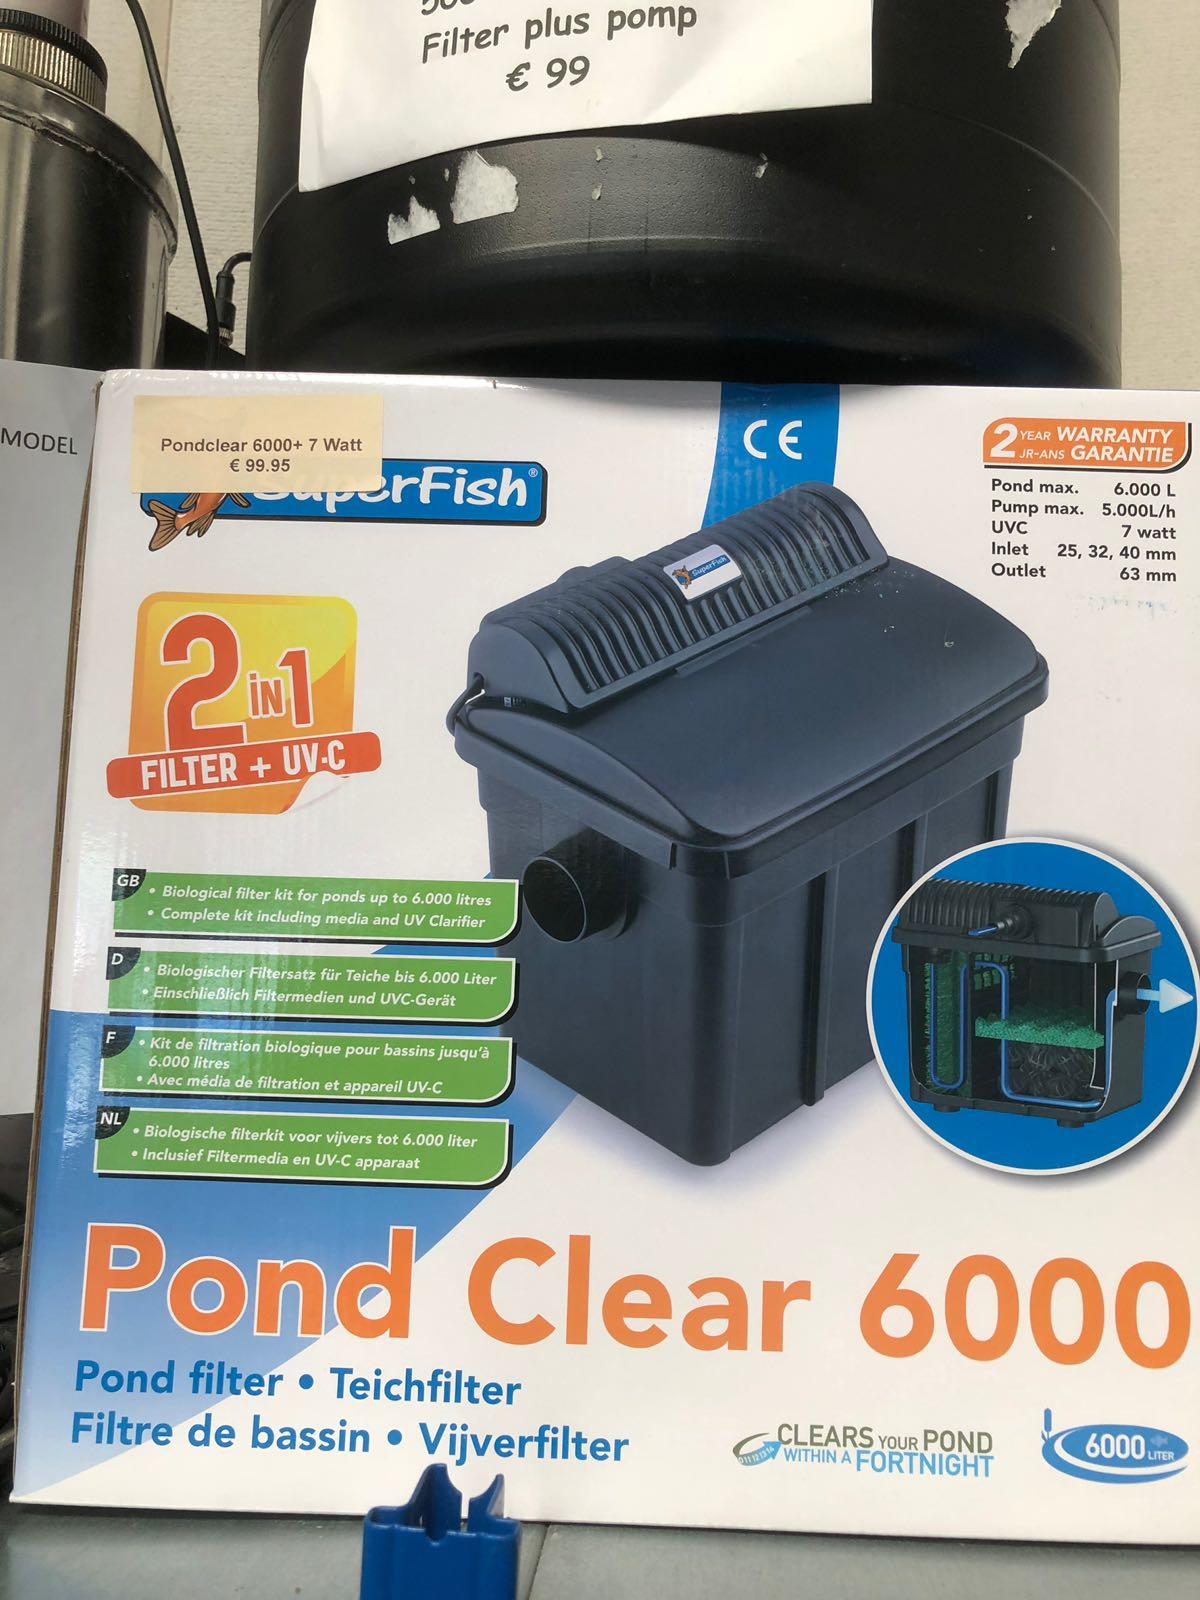 Superfish Pondclear 6000